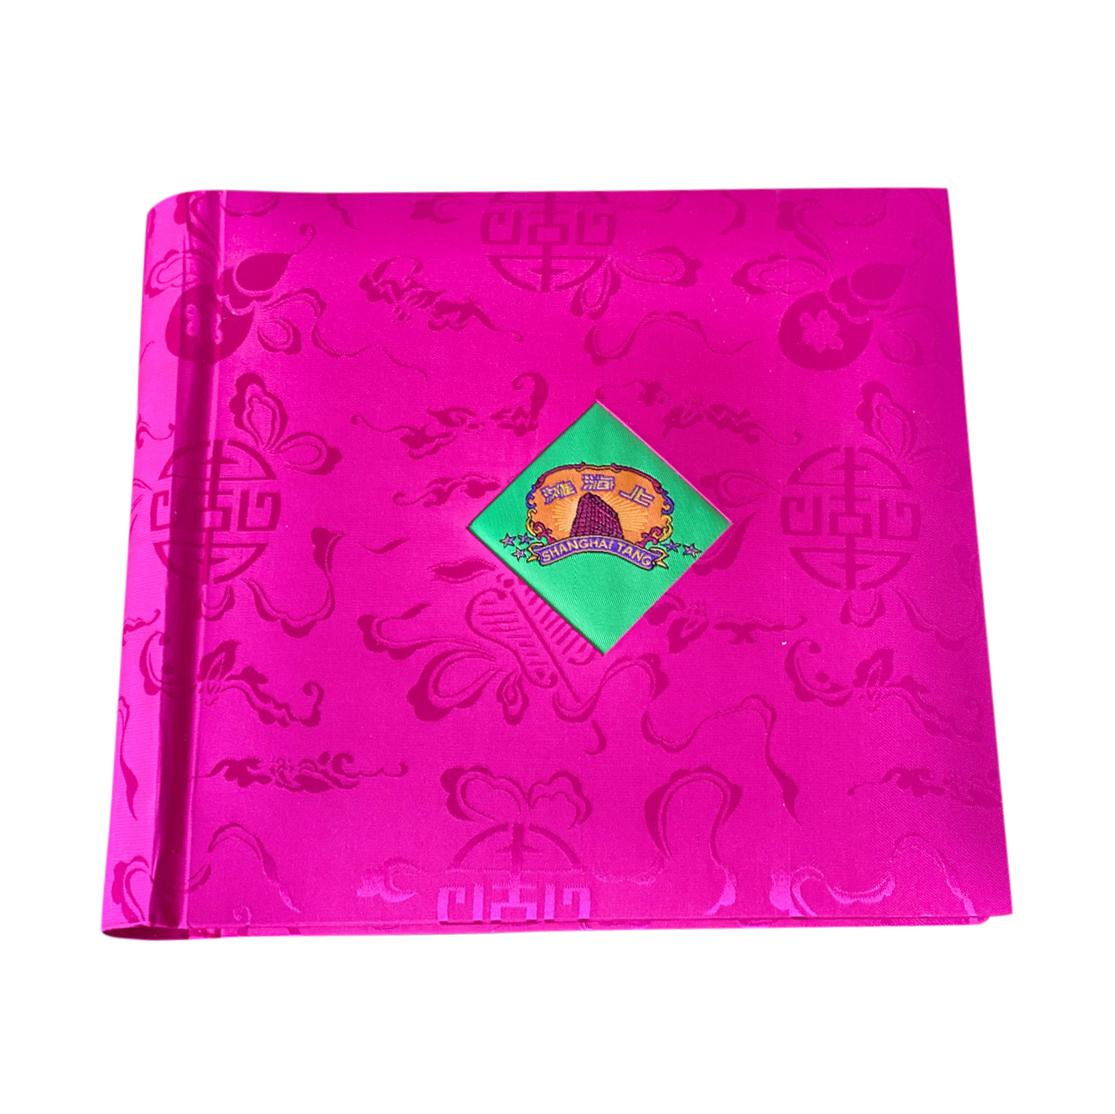 Shanghai Tang Pink Silk Photo Album